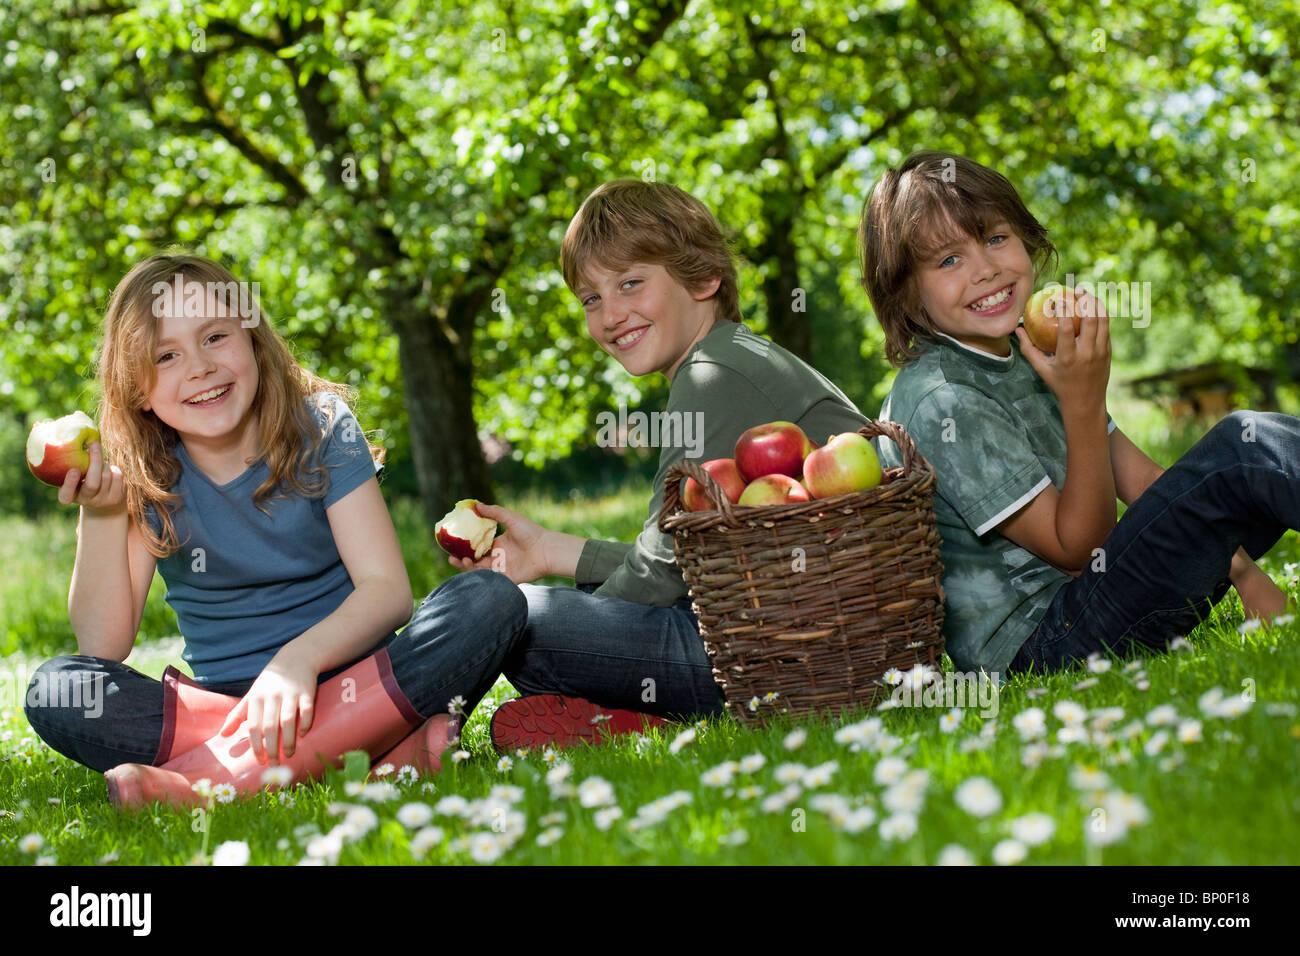 Kids in meadow, eating apples - Stock Image